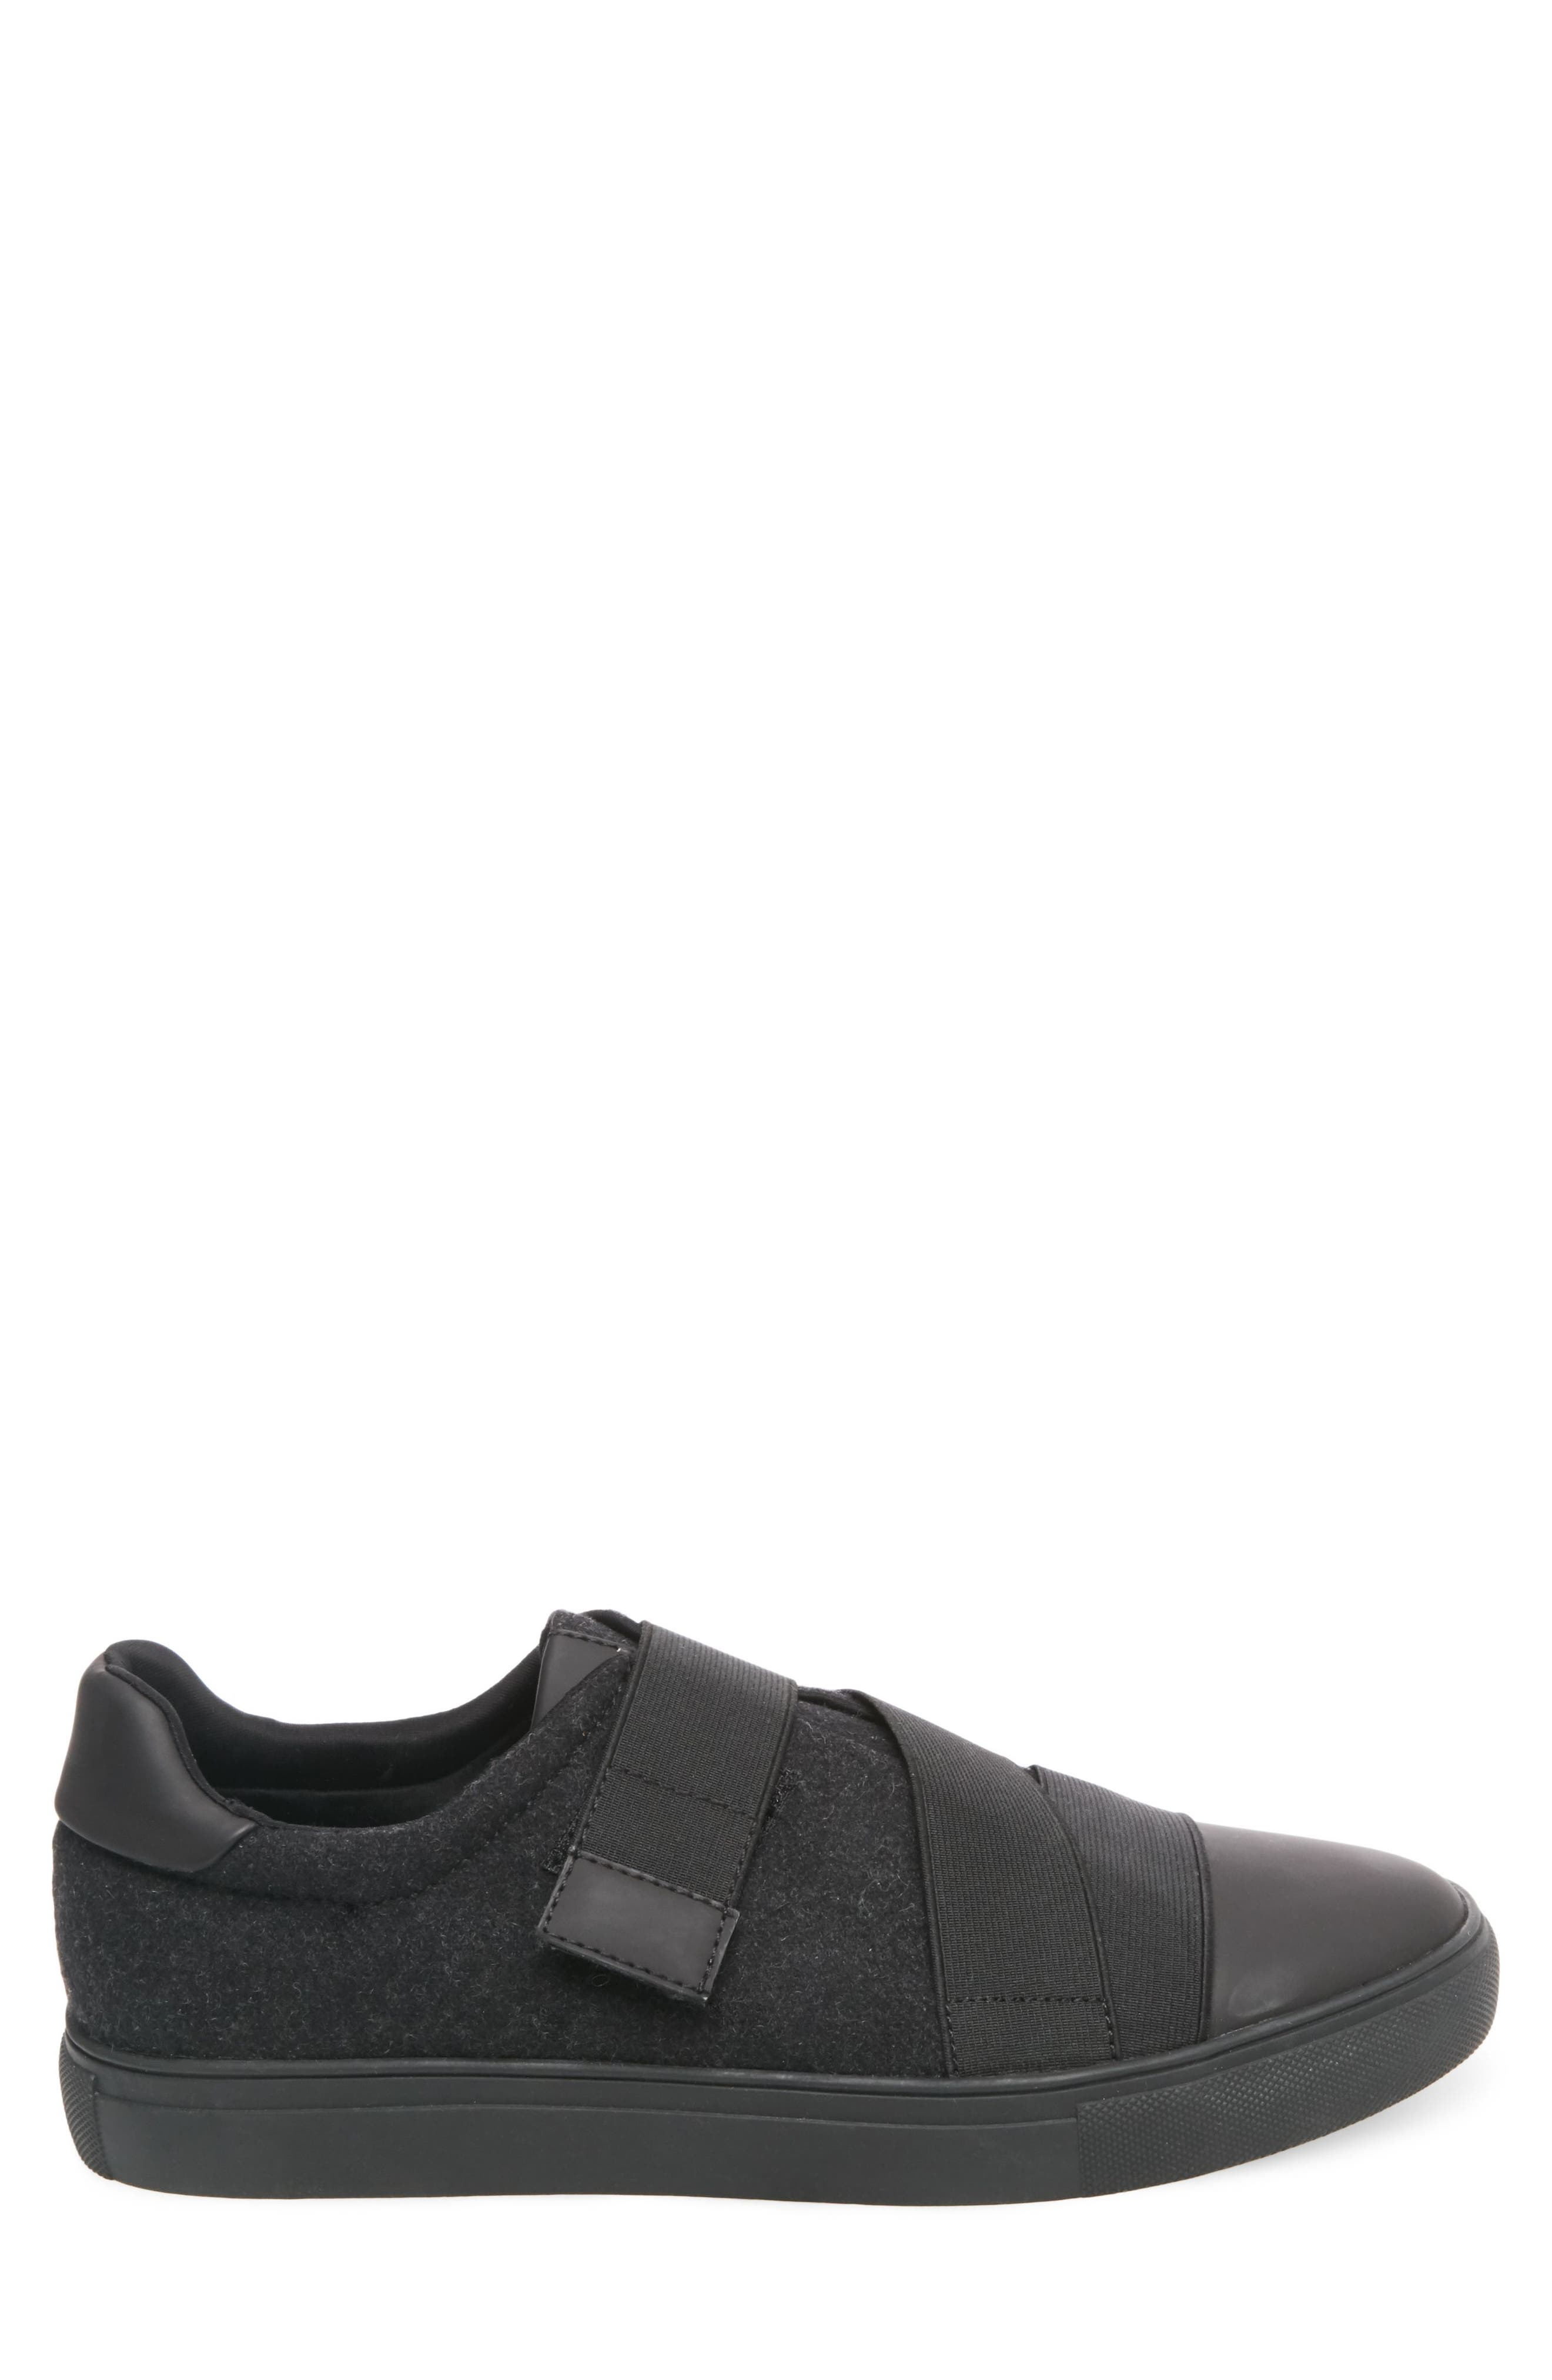 Westy Sneaker,                             Alternate thumbnail 3, color,                             002